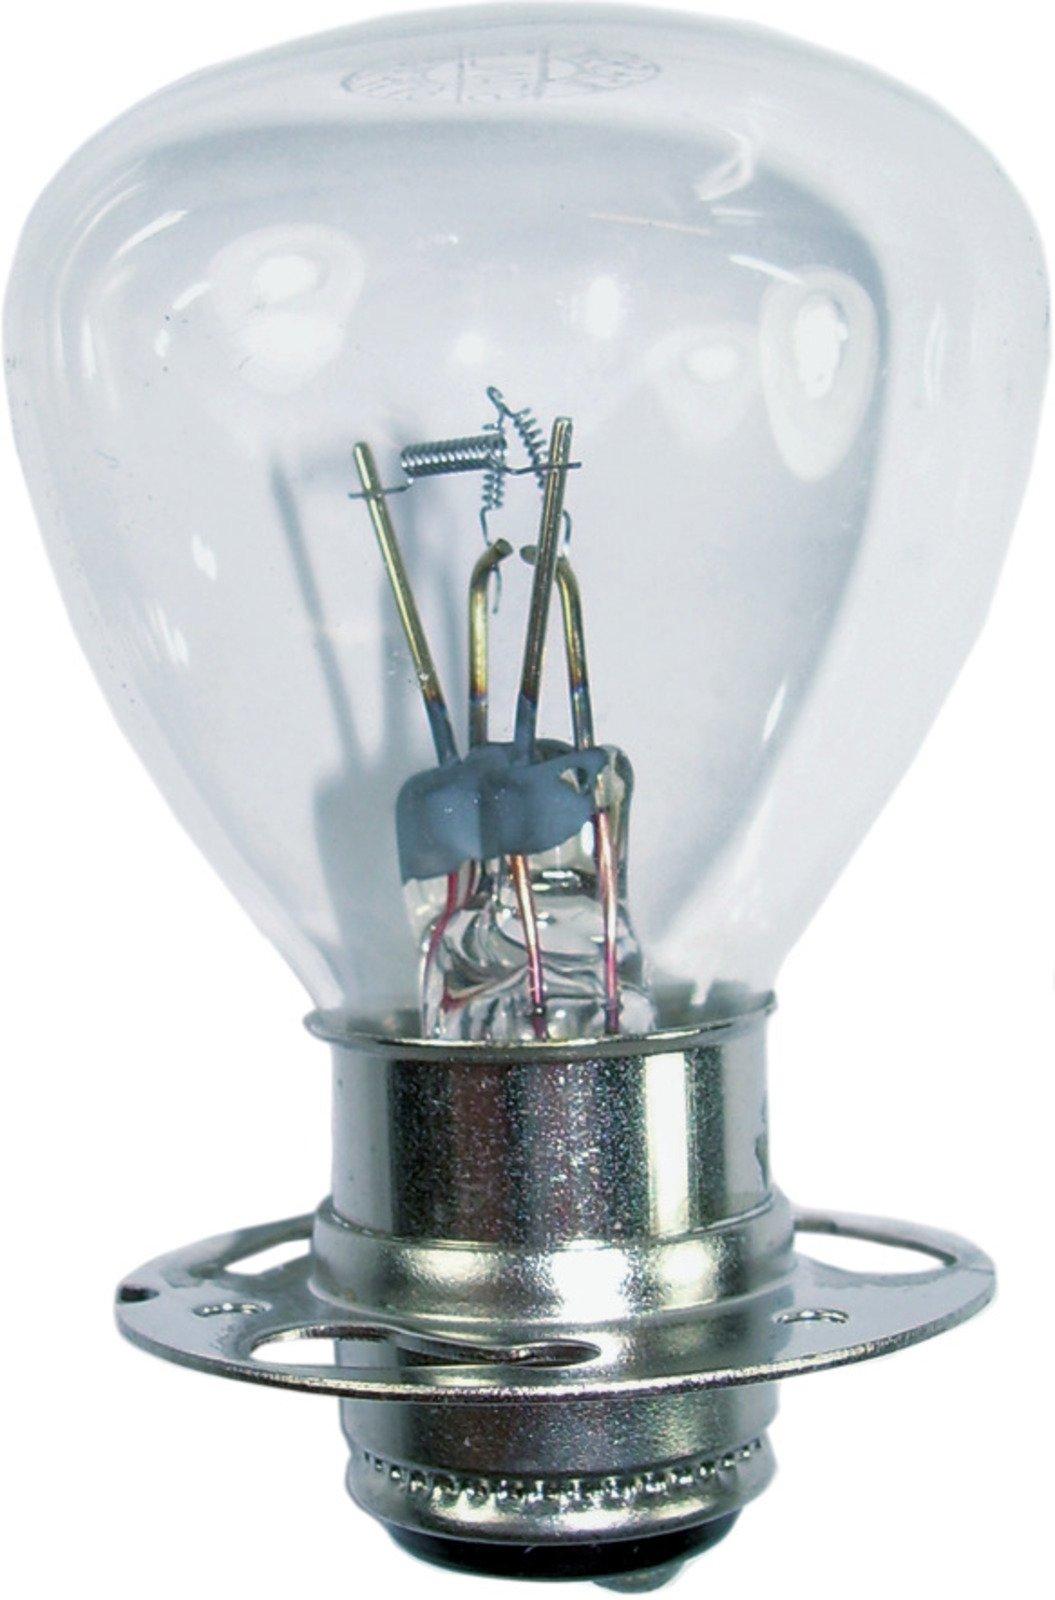 Yamaha TT500 6V 35/35W 214-84114-60-00 Replica Alernative Bulb 19-018